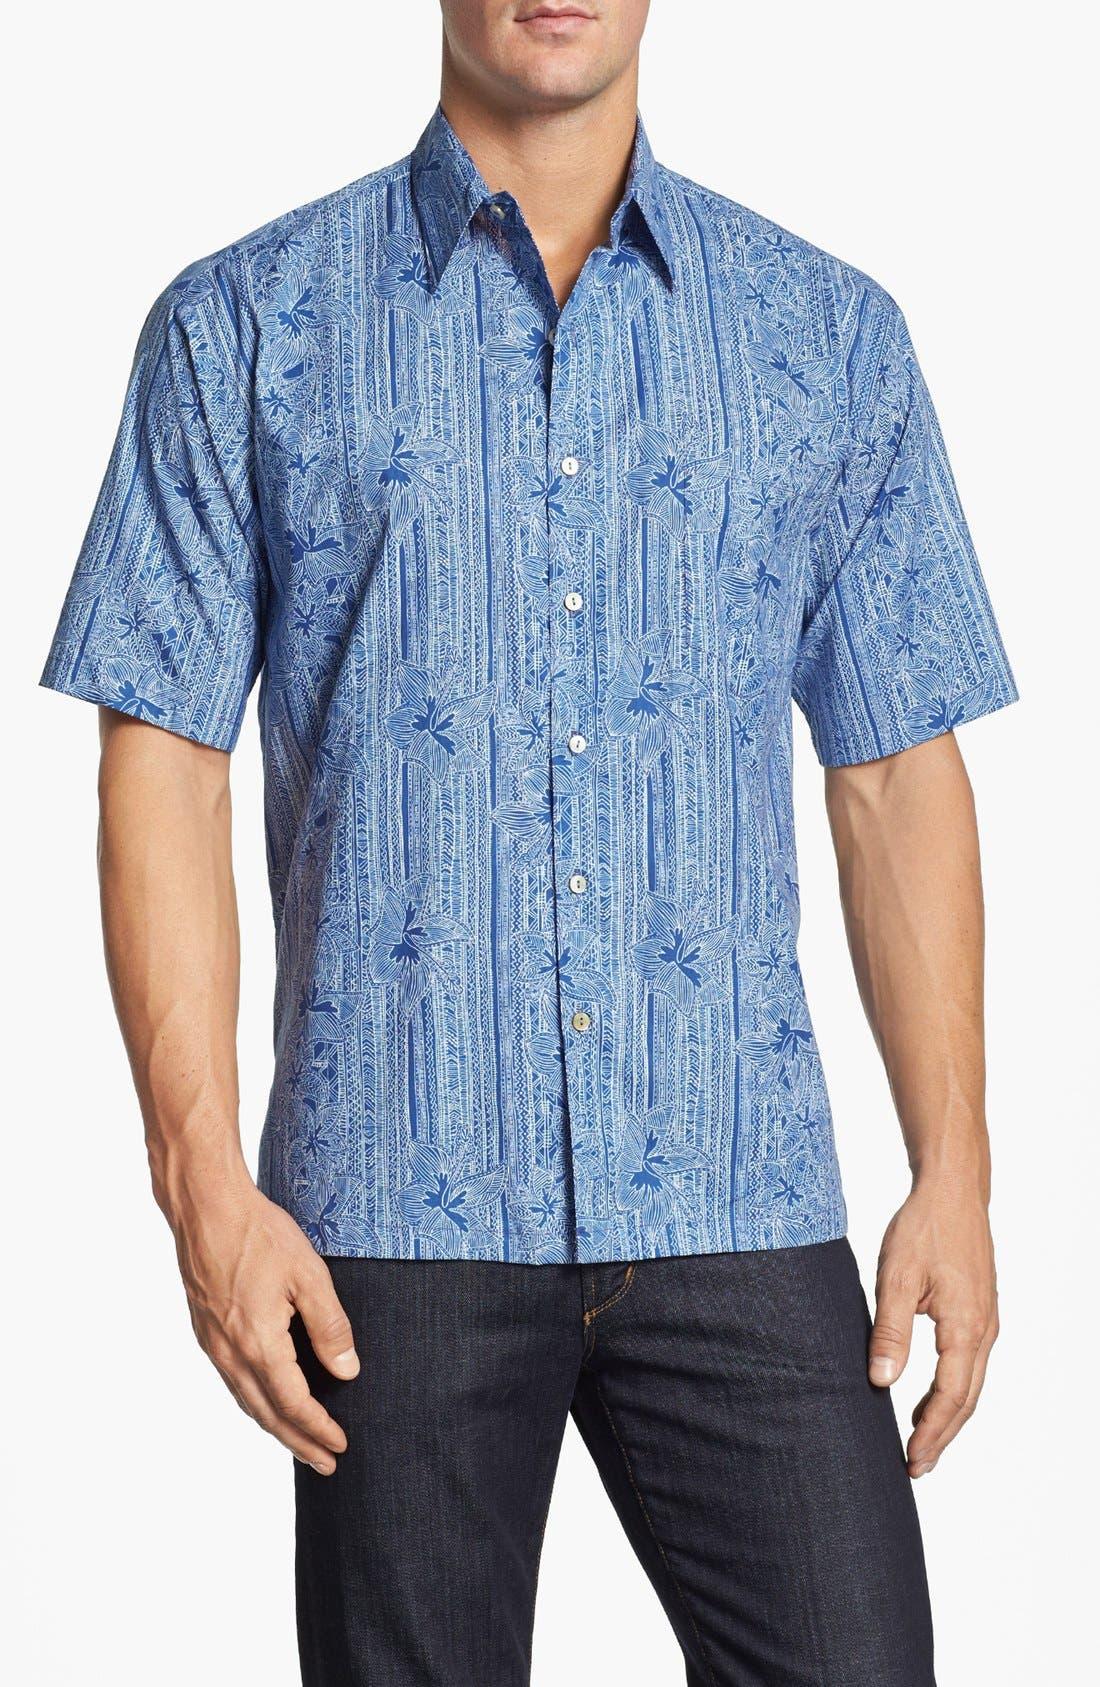 Alternate Image 1 Selected - Tori Richard 'Wall Flower' Short Sleeve Sport Shirt